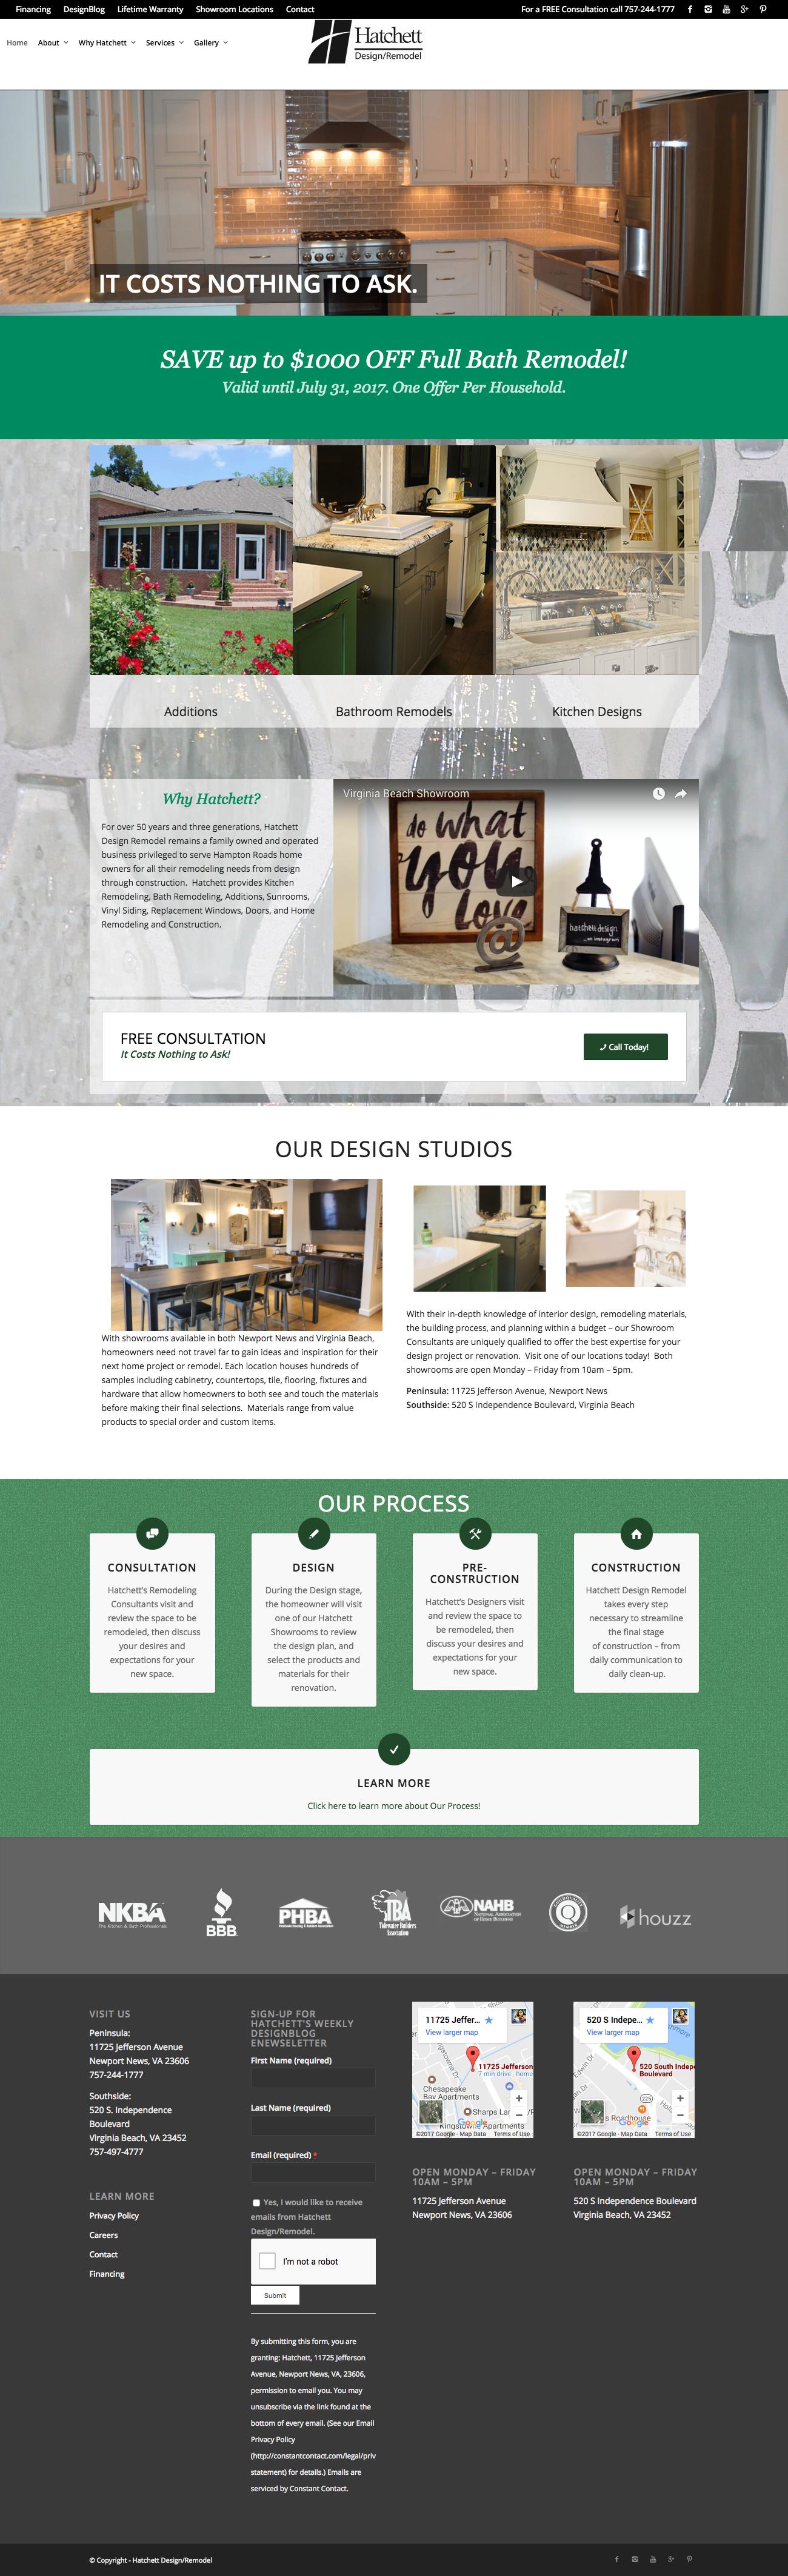 Hatchett DesignRemodel The Rogers Agency - Hatchett bathroom remodel